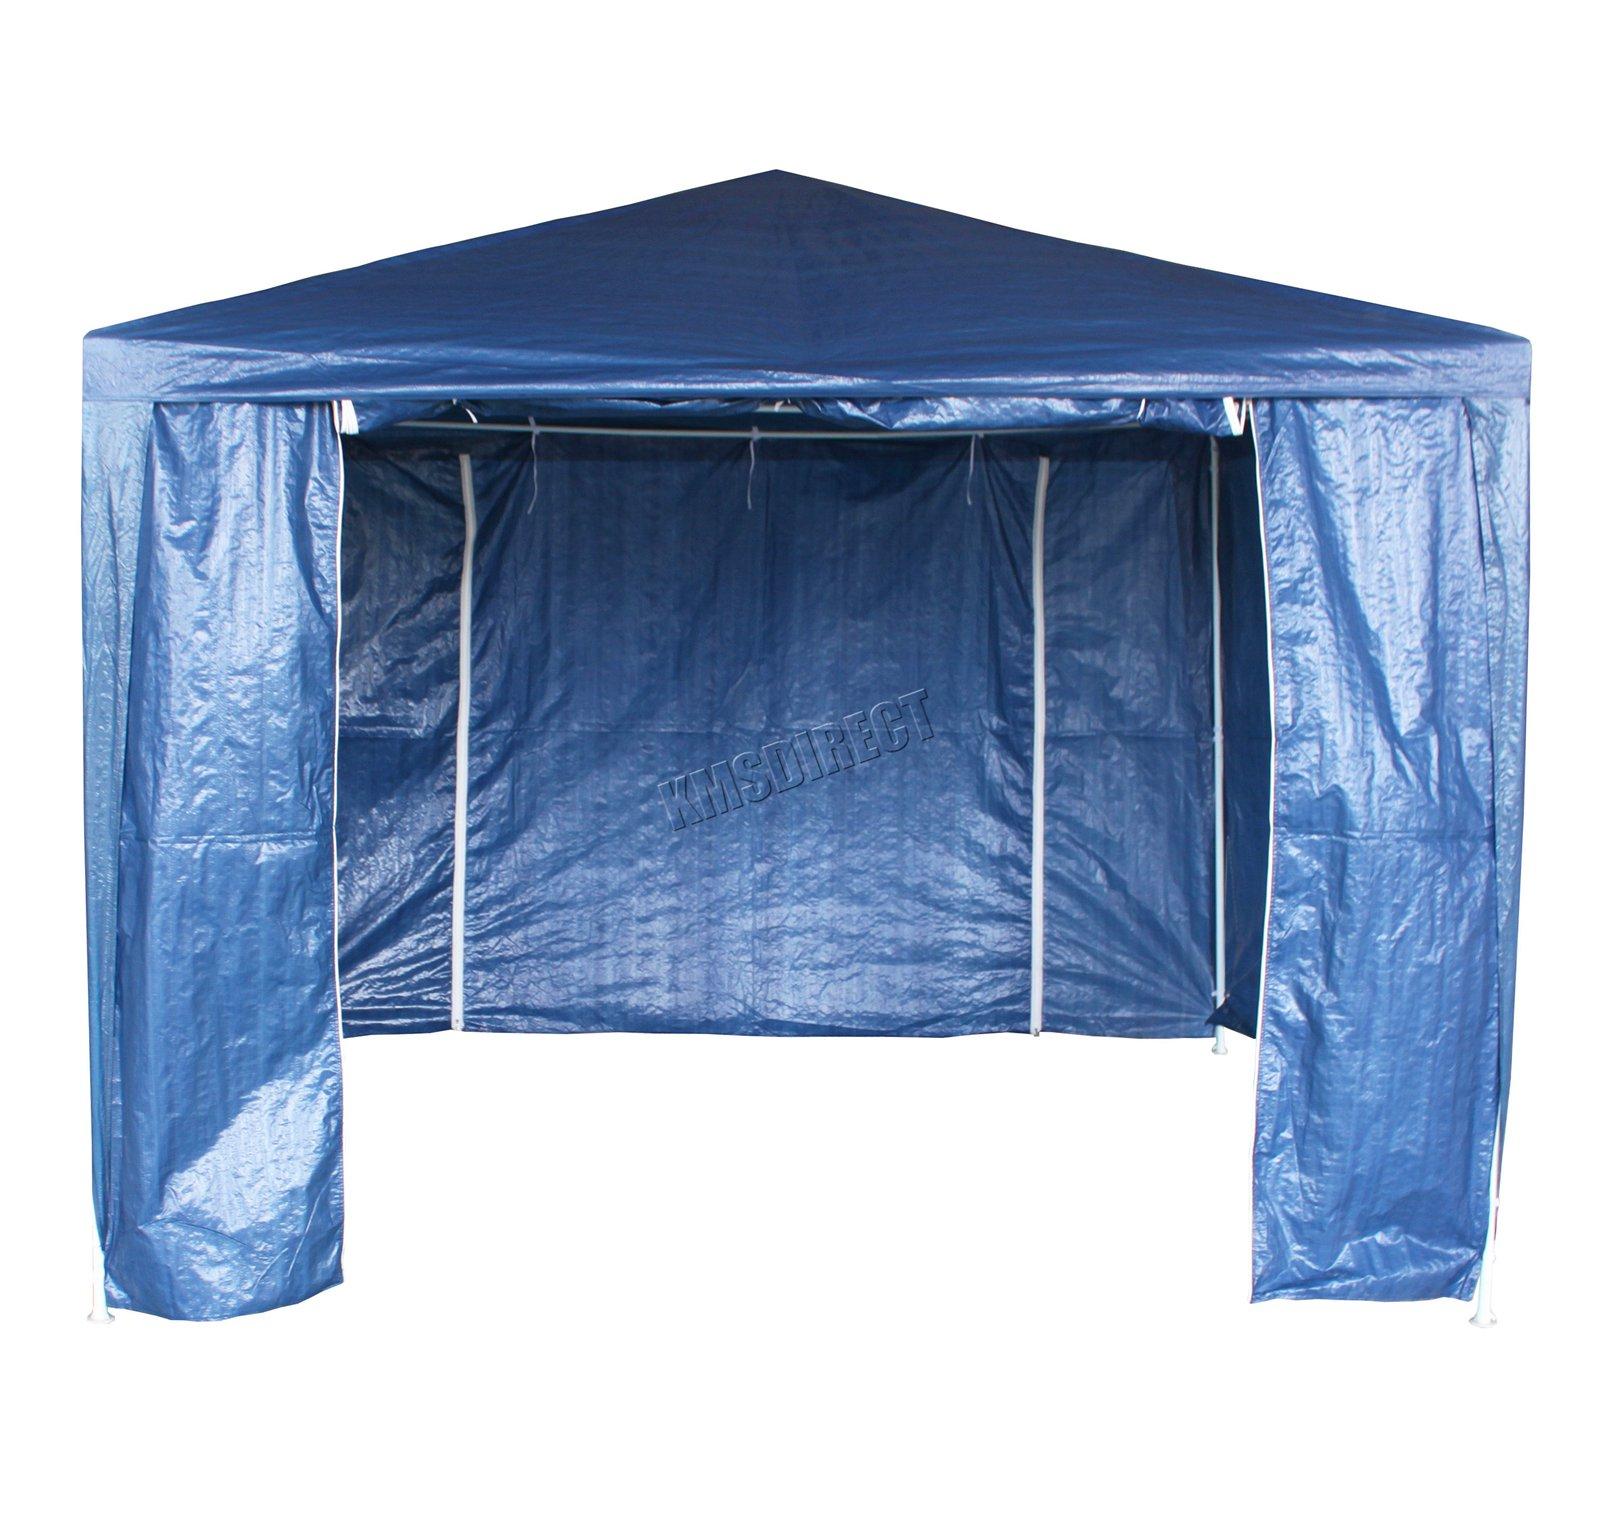 New-3-x-3m-120g-Waterproof-Outdoor-PE-Garden-Gazebo-Marquee-Canopy-Party-Tent Indexbild 20